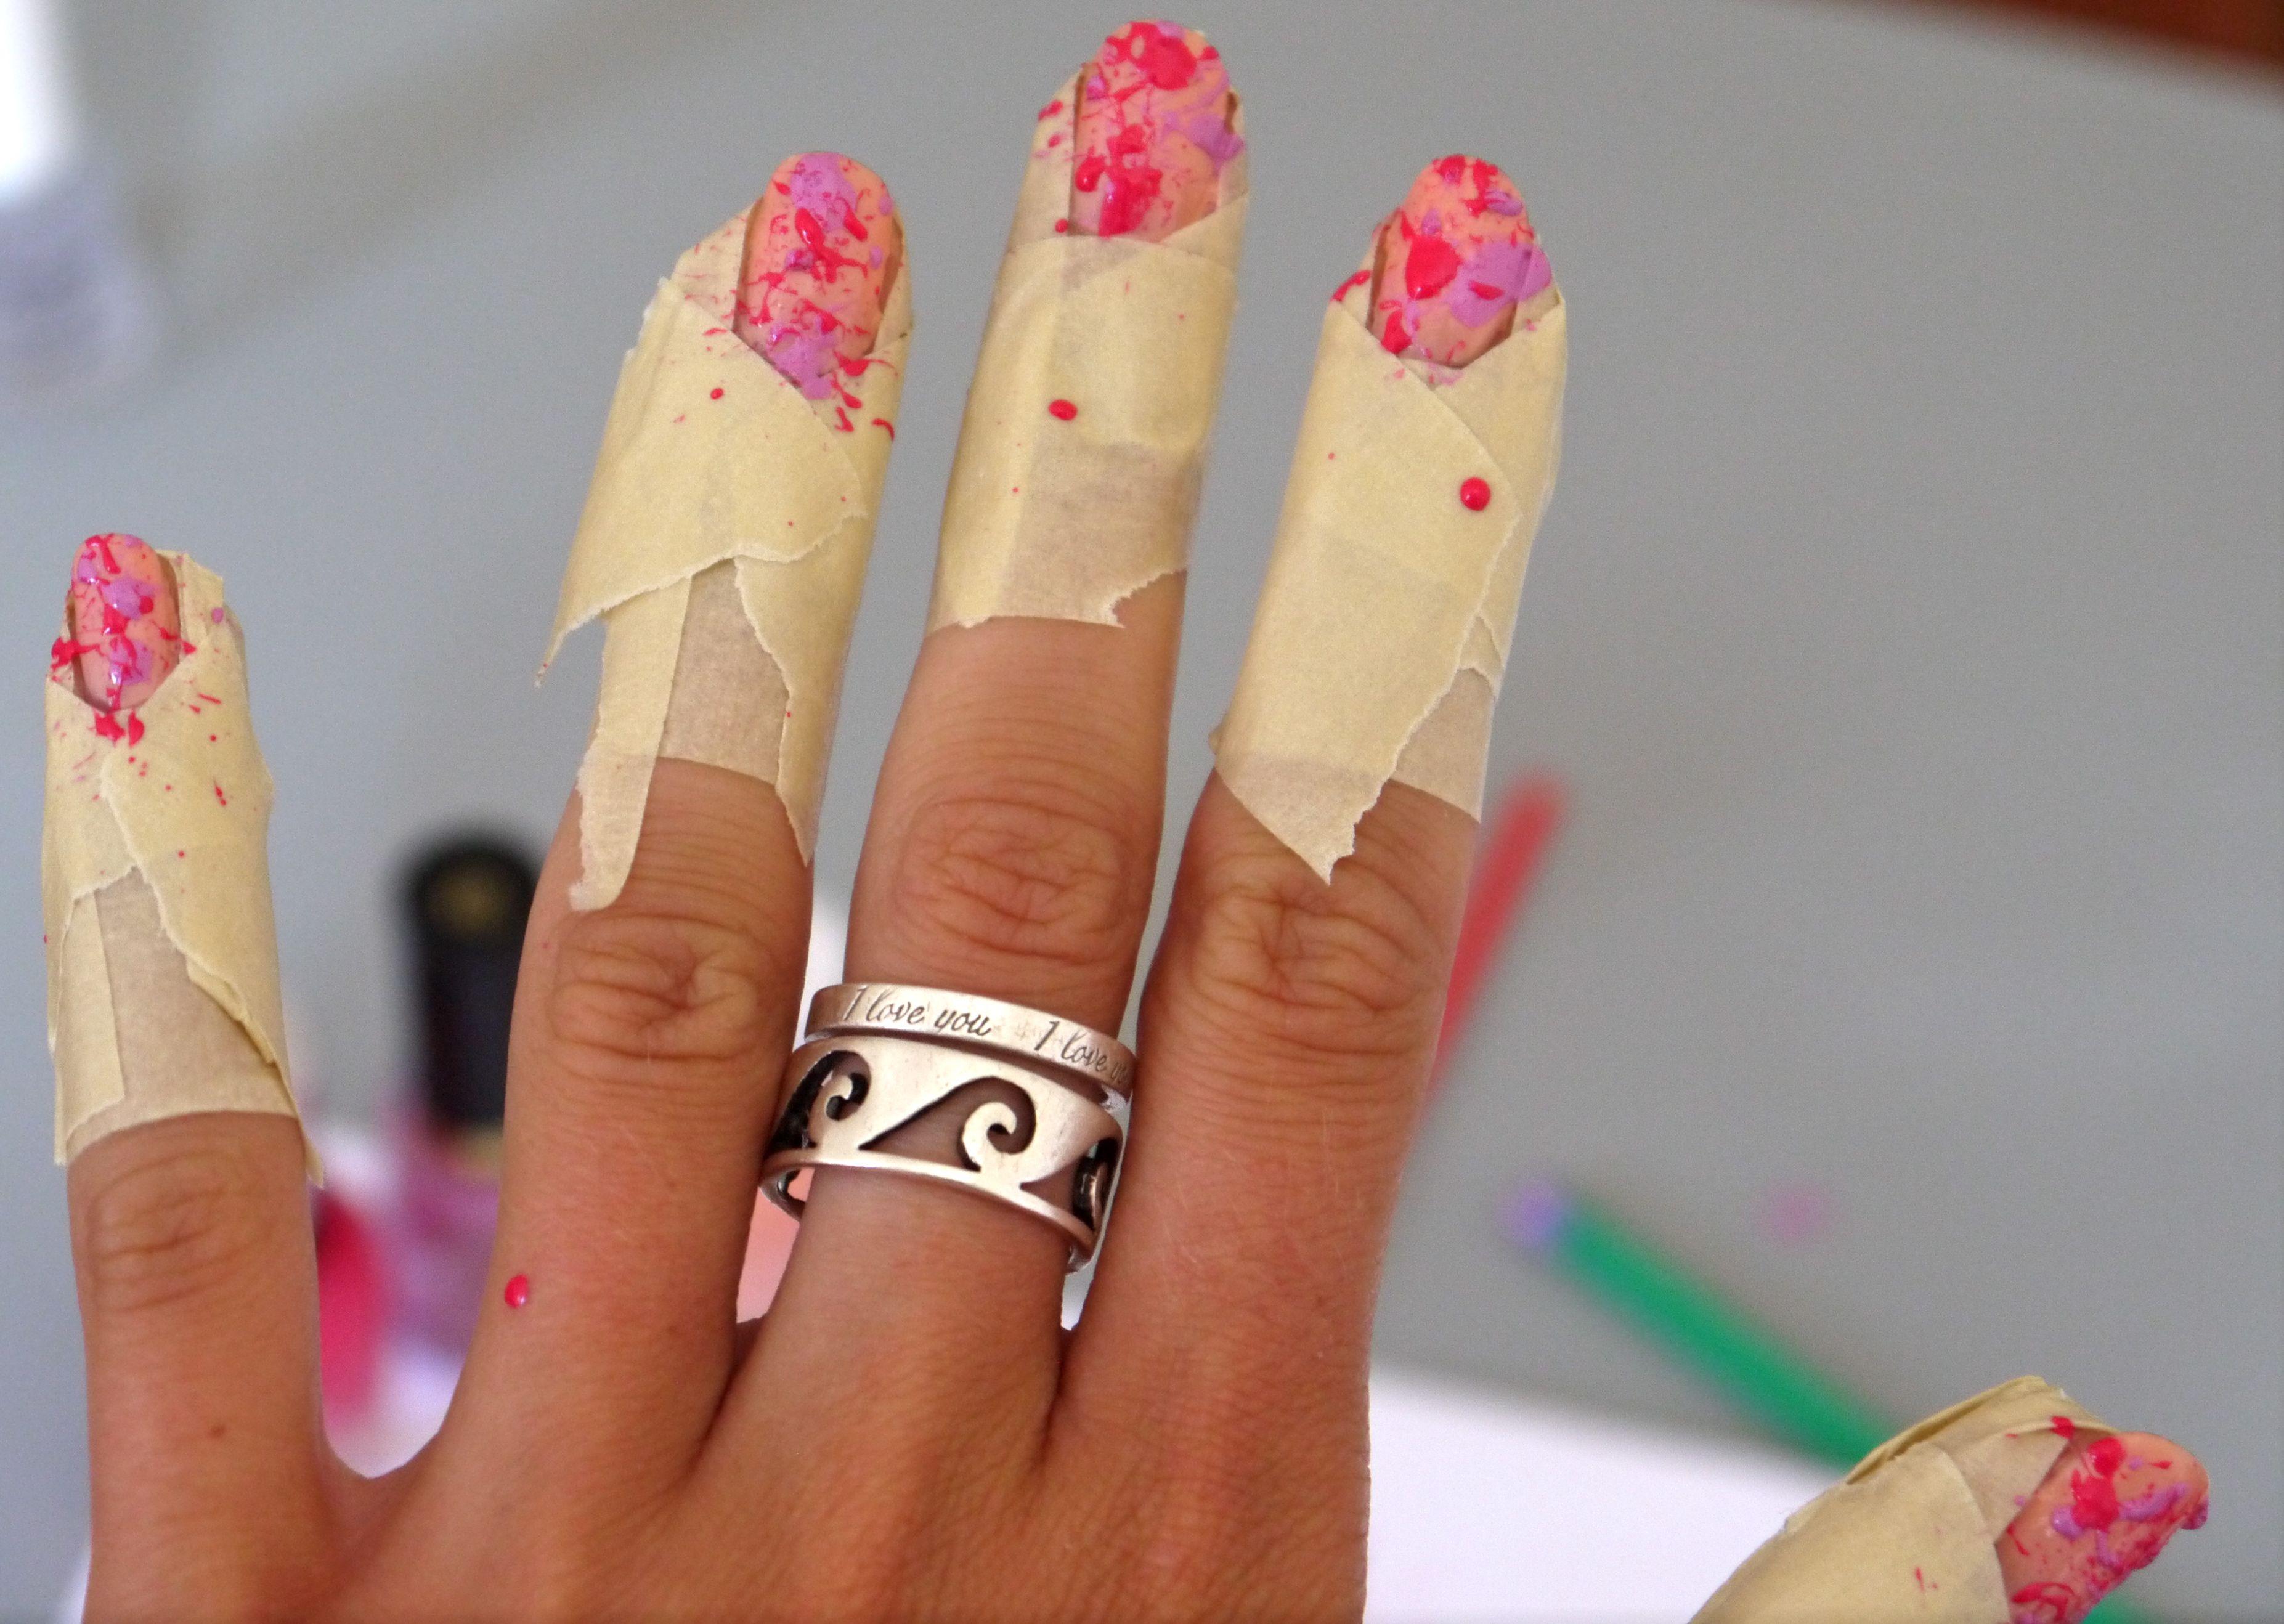 diy splatter nail polish | Style | Pinterest | Splatter nails